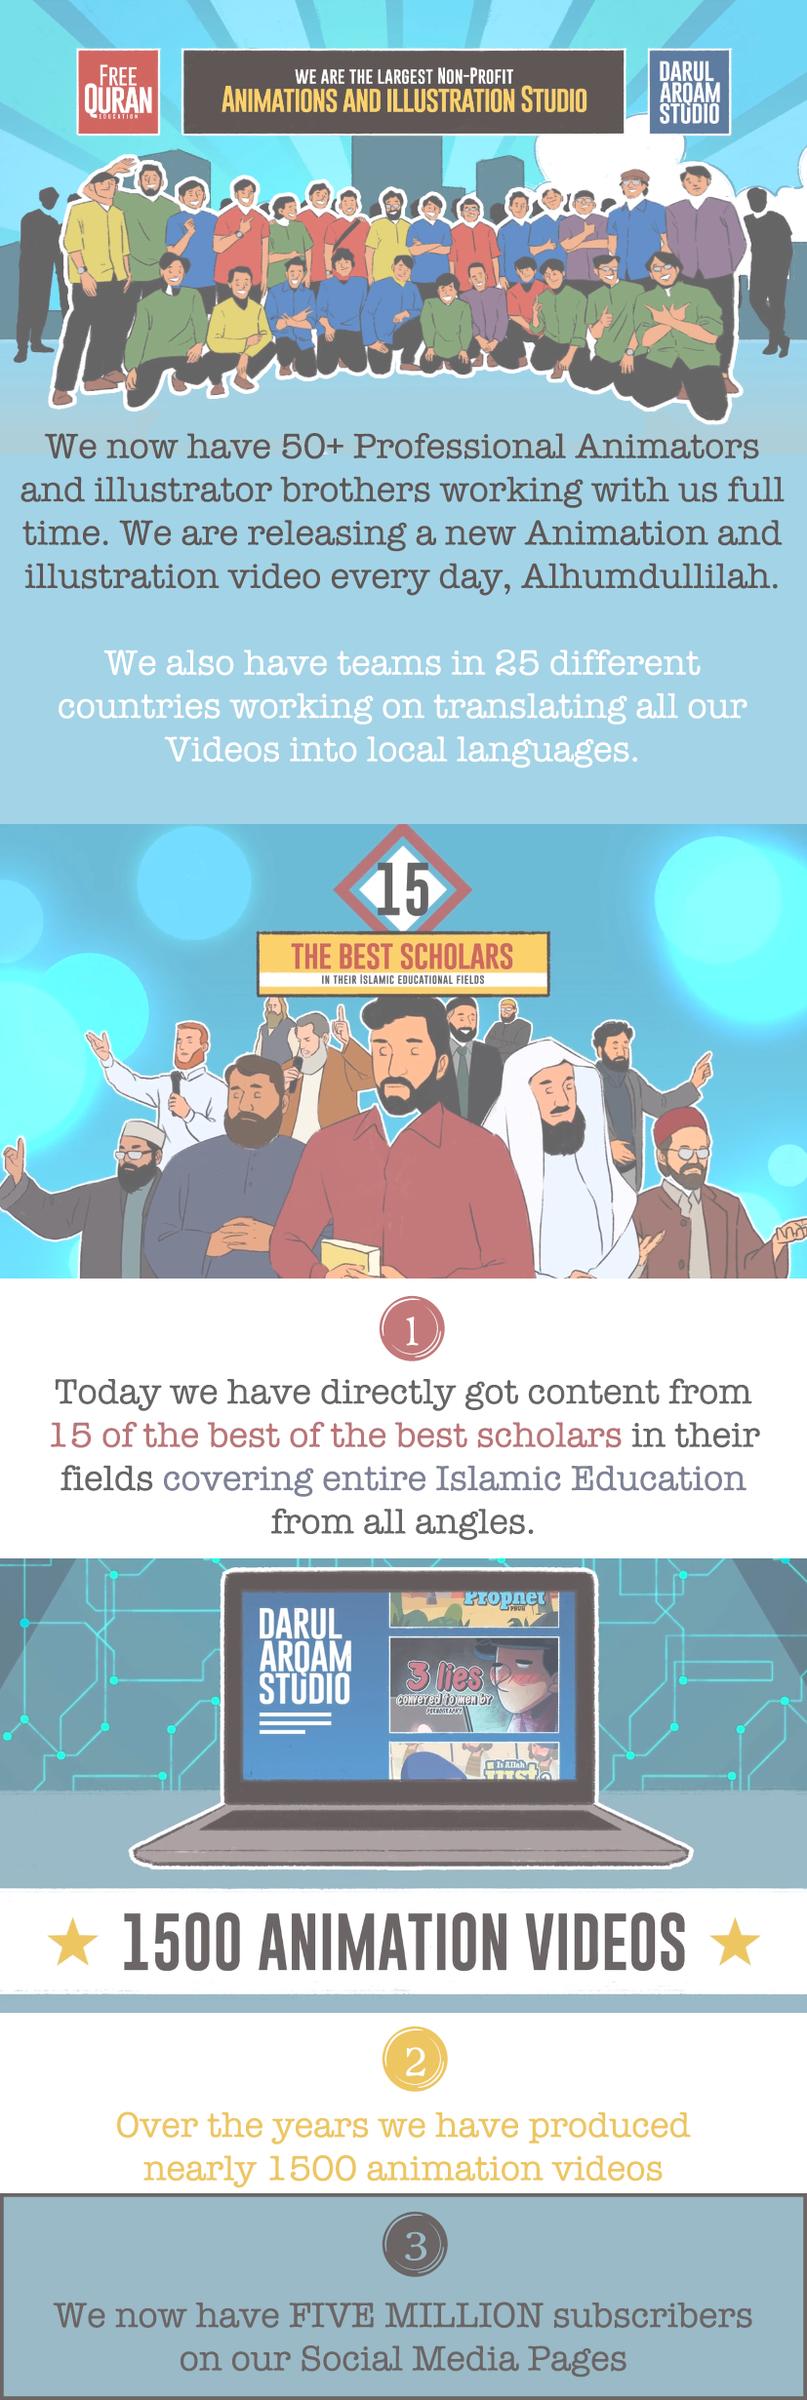 Islamic Education Revolution - Making Islamic Education A